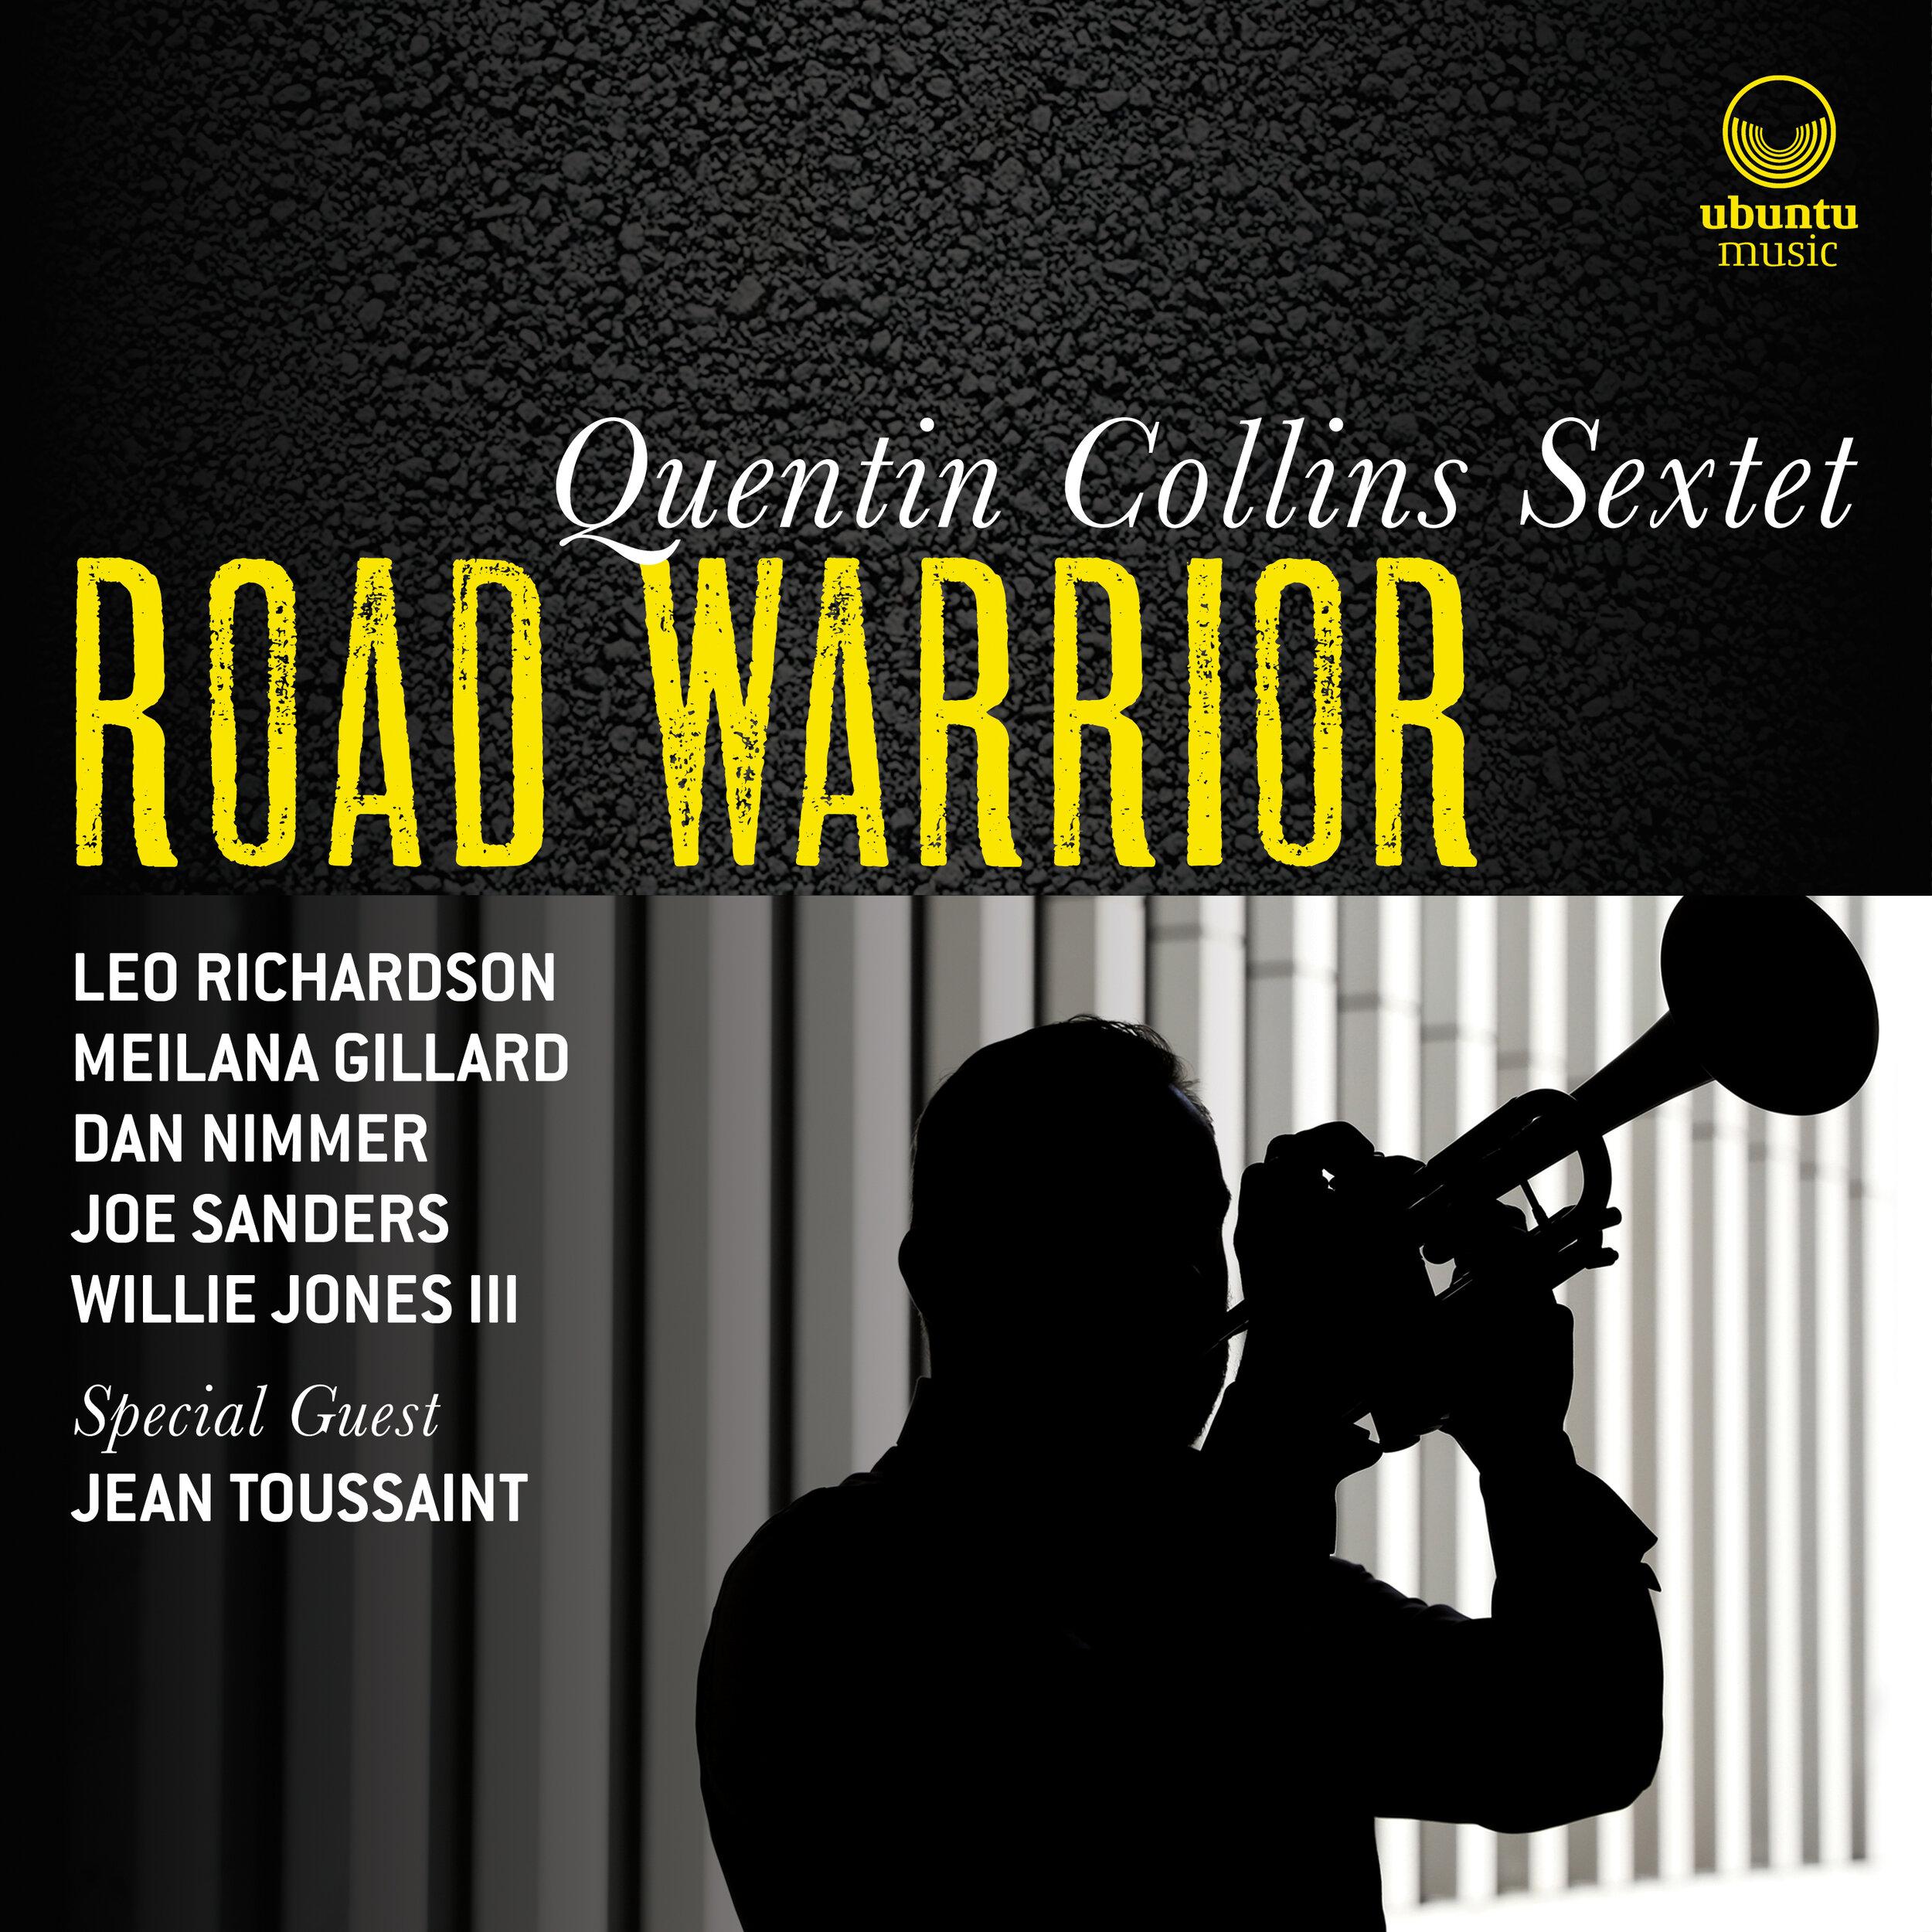 UBU0027_Quentin Collins Sextet_Road Warrior_3000x3000_cov.jpg